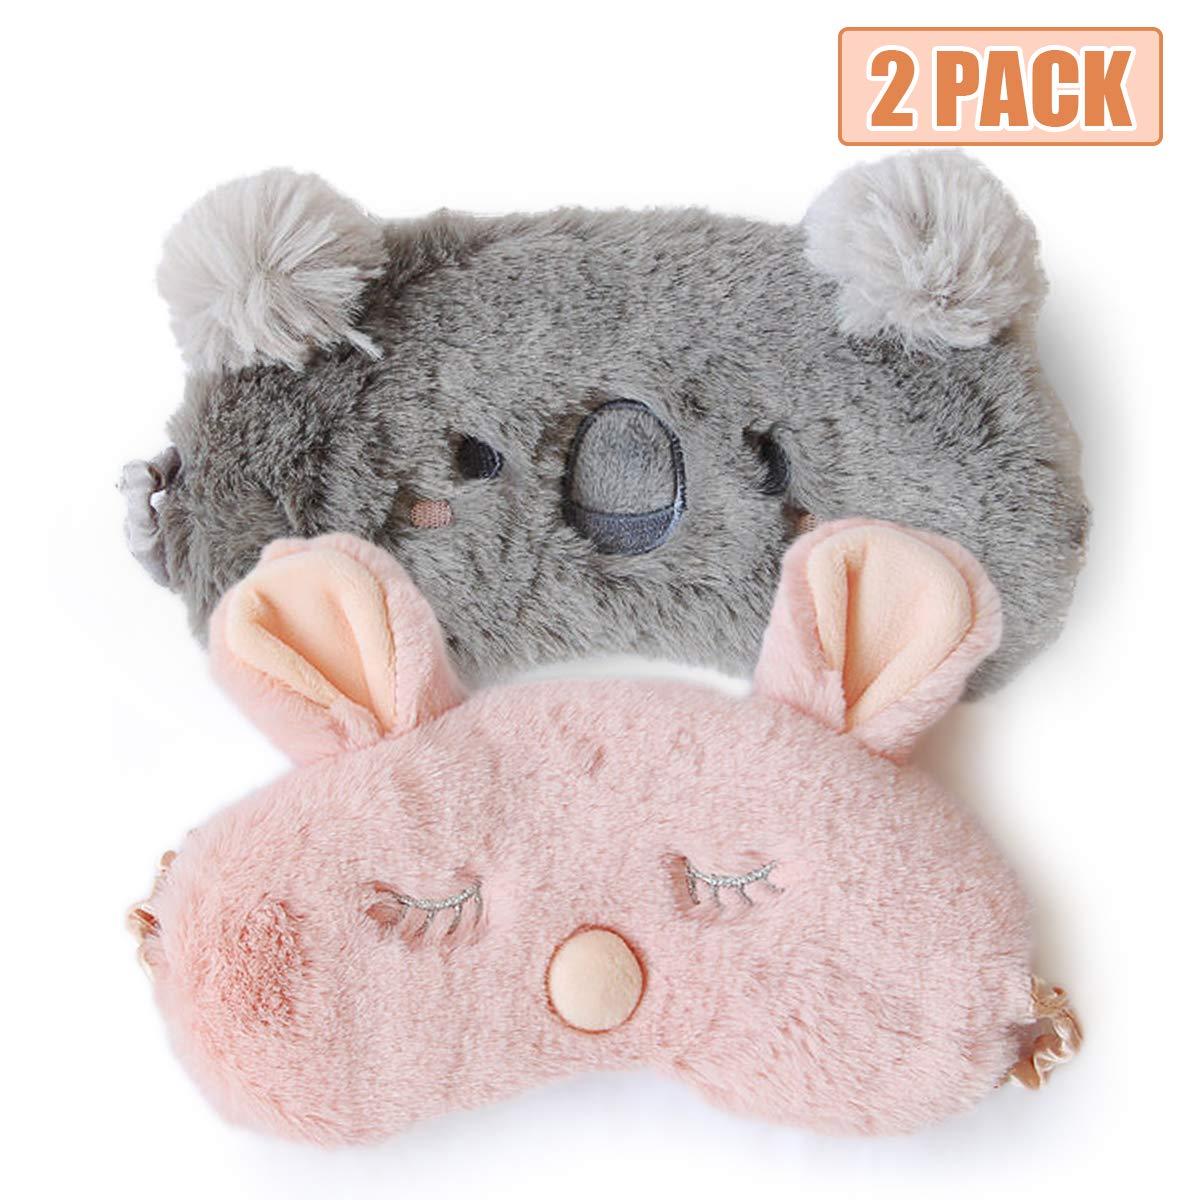 Cute Sleep Mask - Soft and Comfortable Animal Plush Blindfold Eye Cover for Kids Girls Women,...